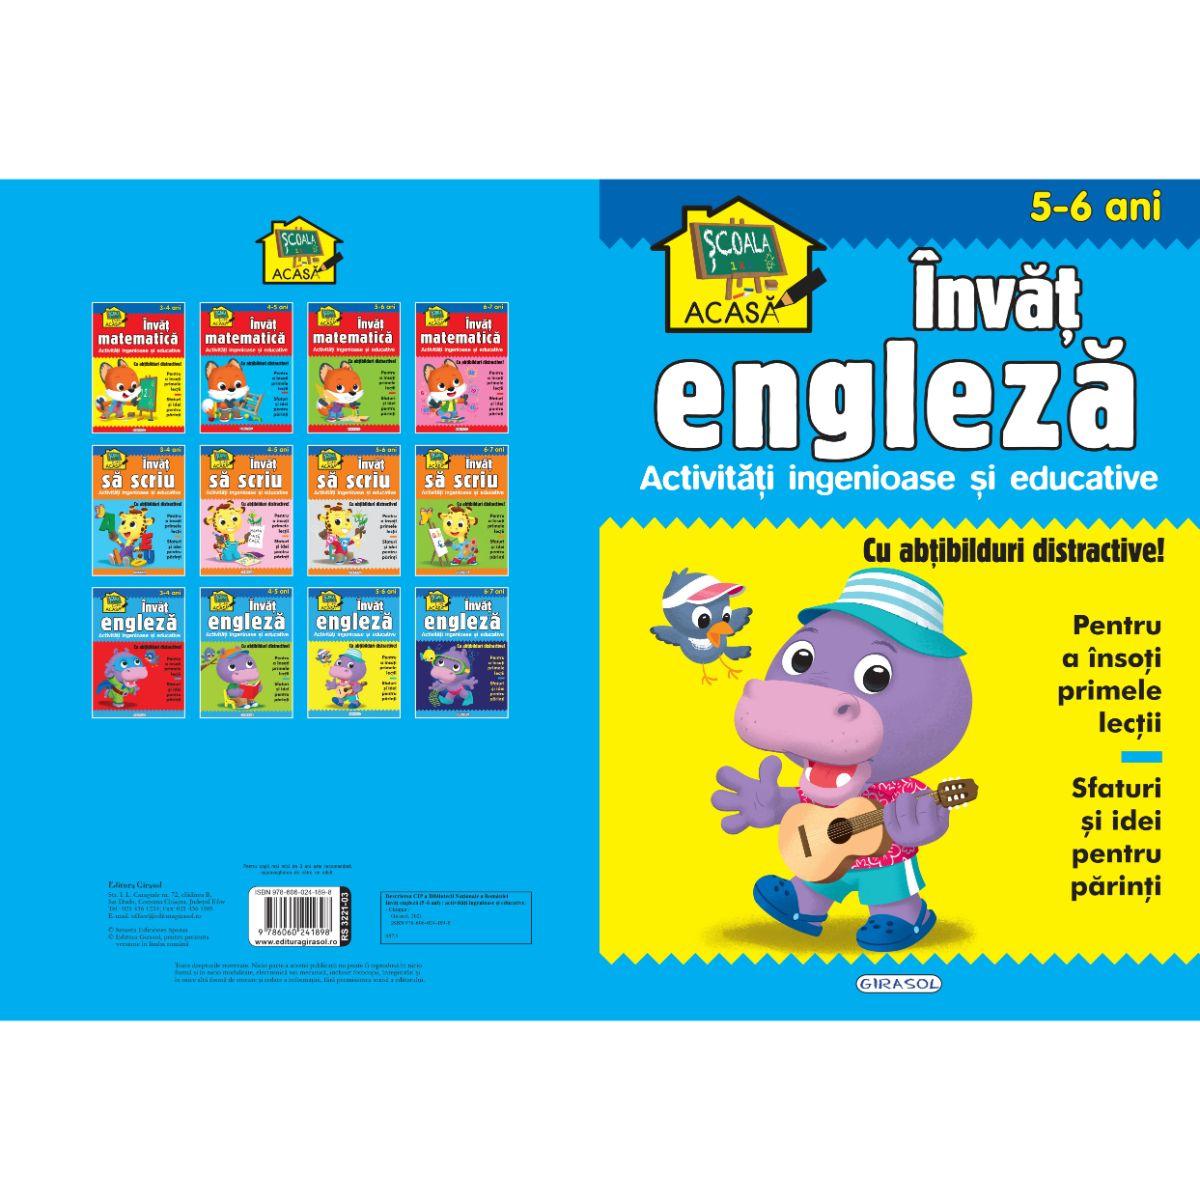 Scoala acasa, Invat engleza, 5-6 ani